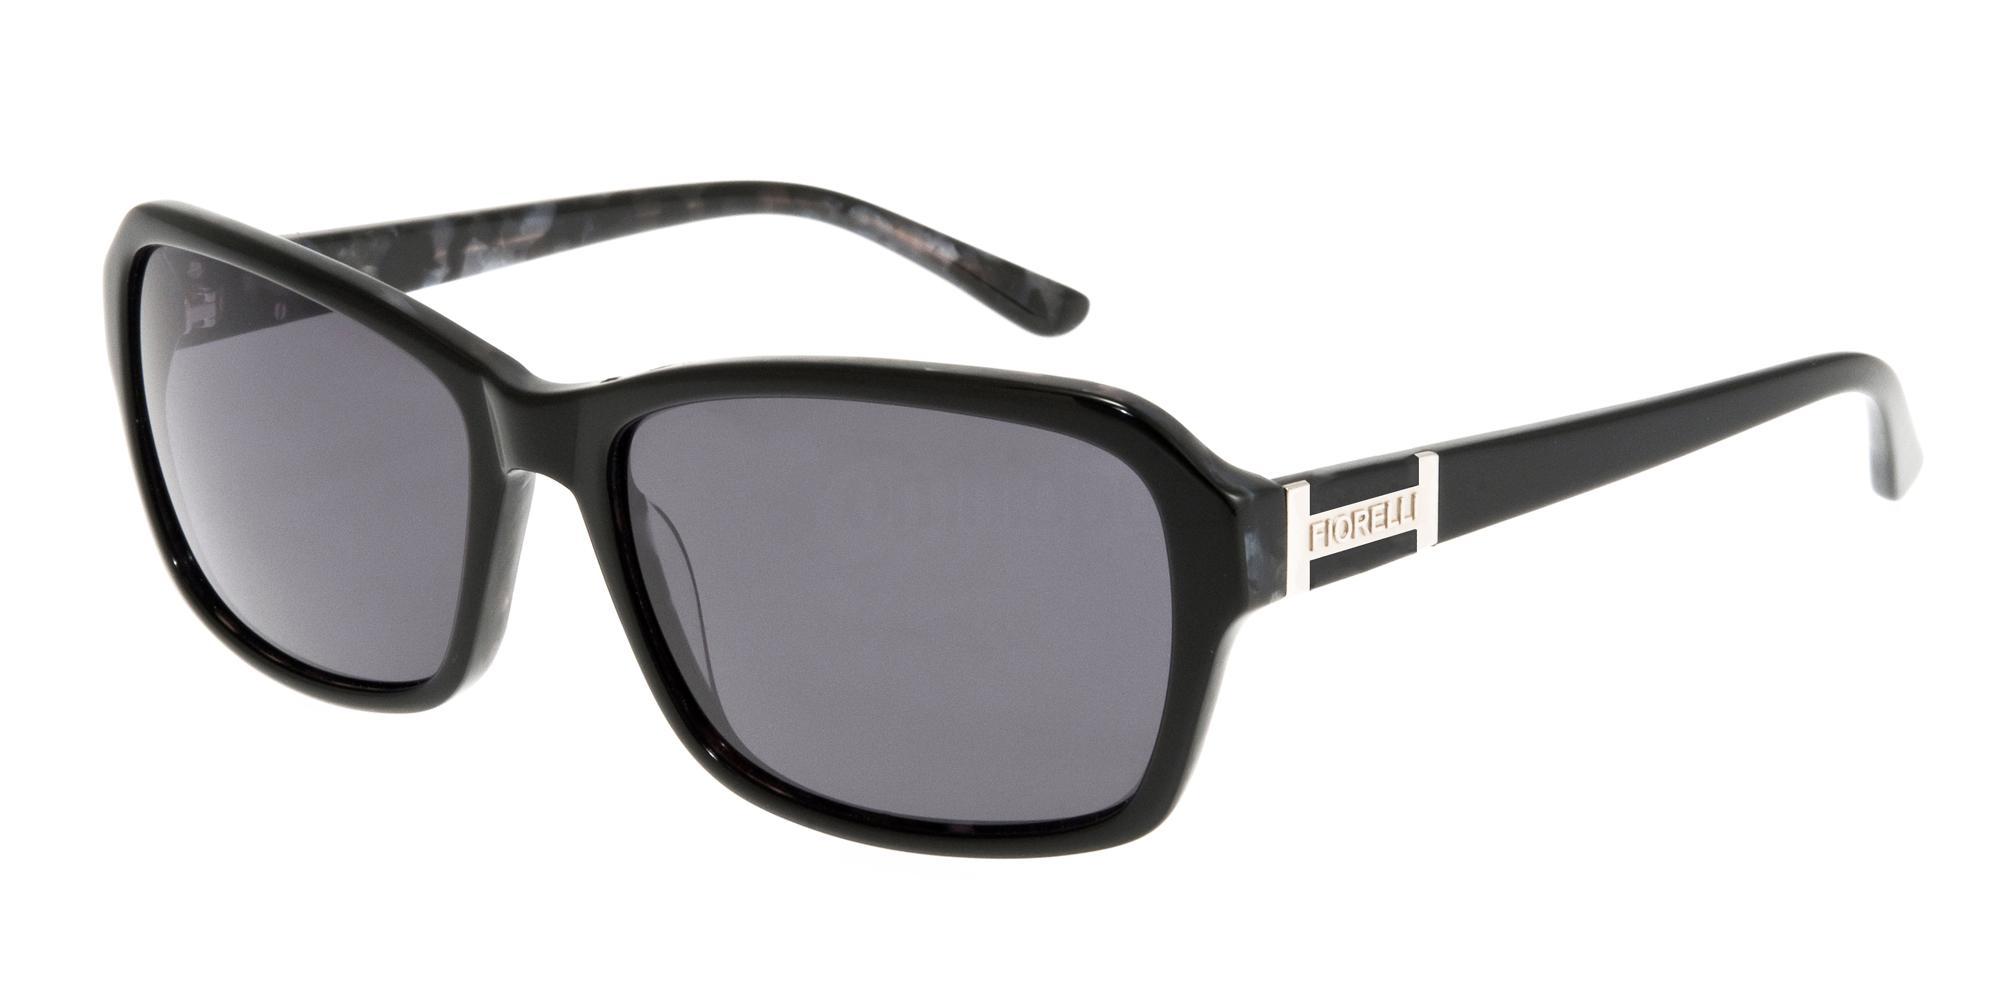 01 FIO059 Sunglasses, Fiorelli